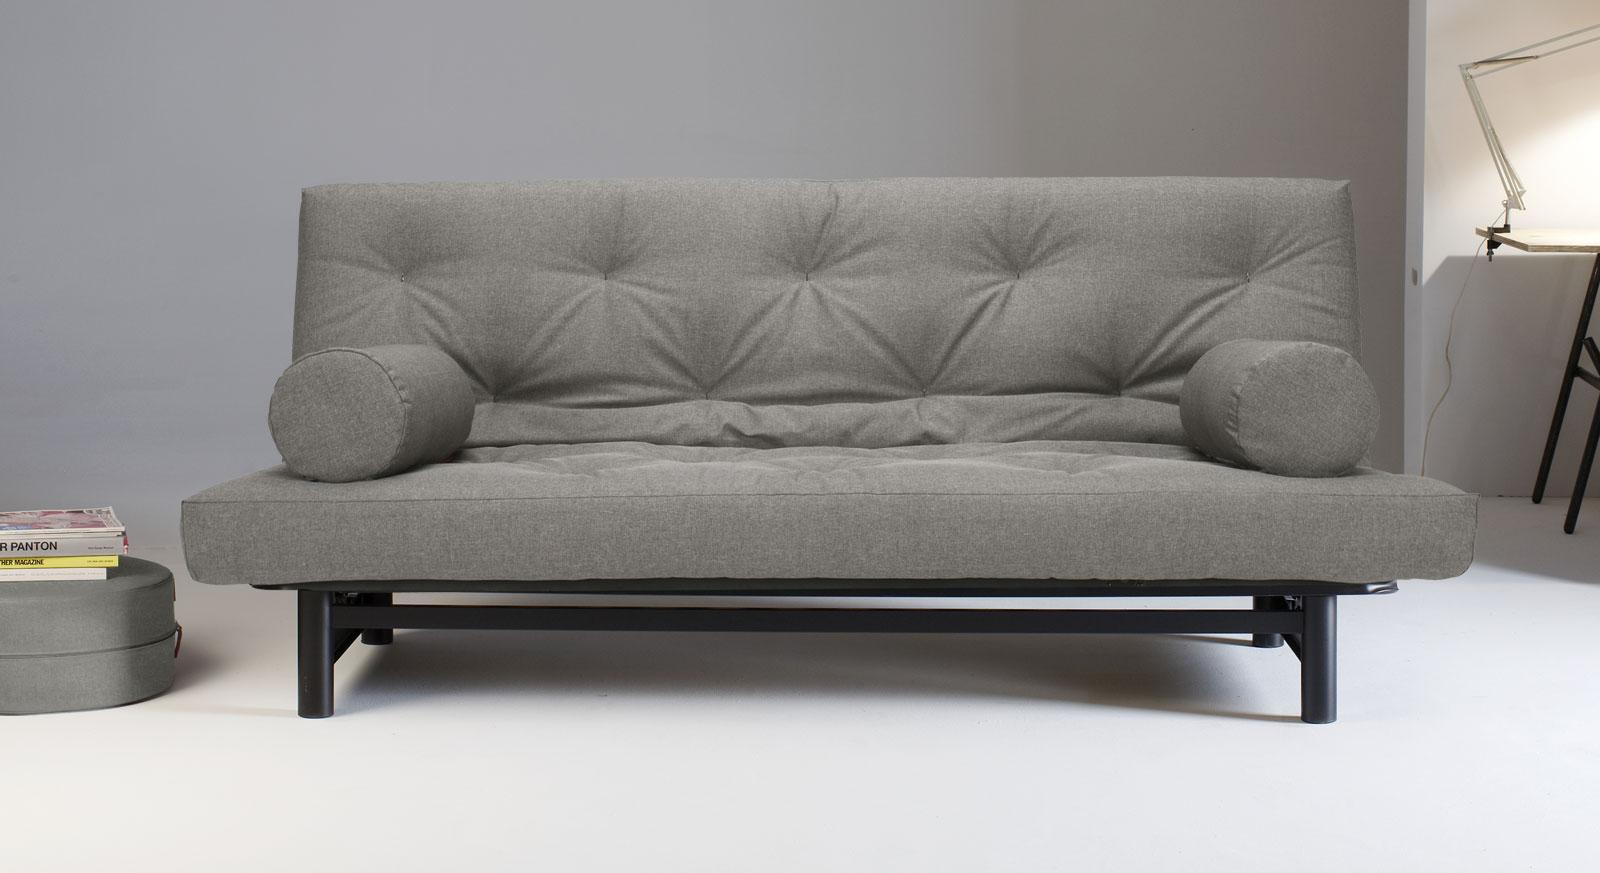 Sofa Del Mar mit grauem versteppten Bezug